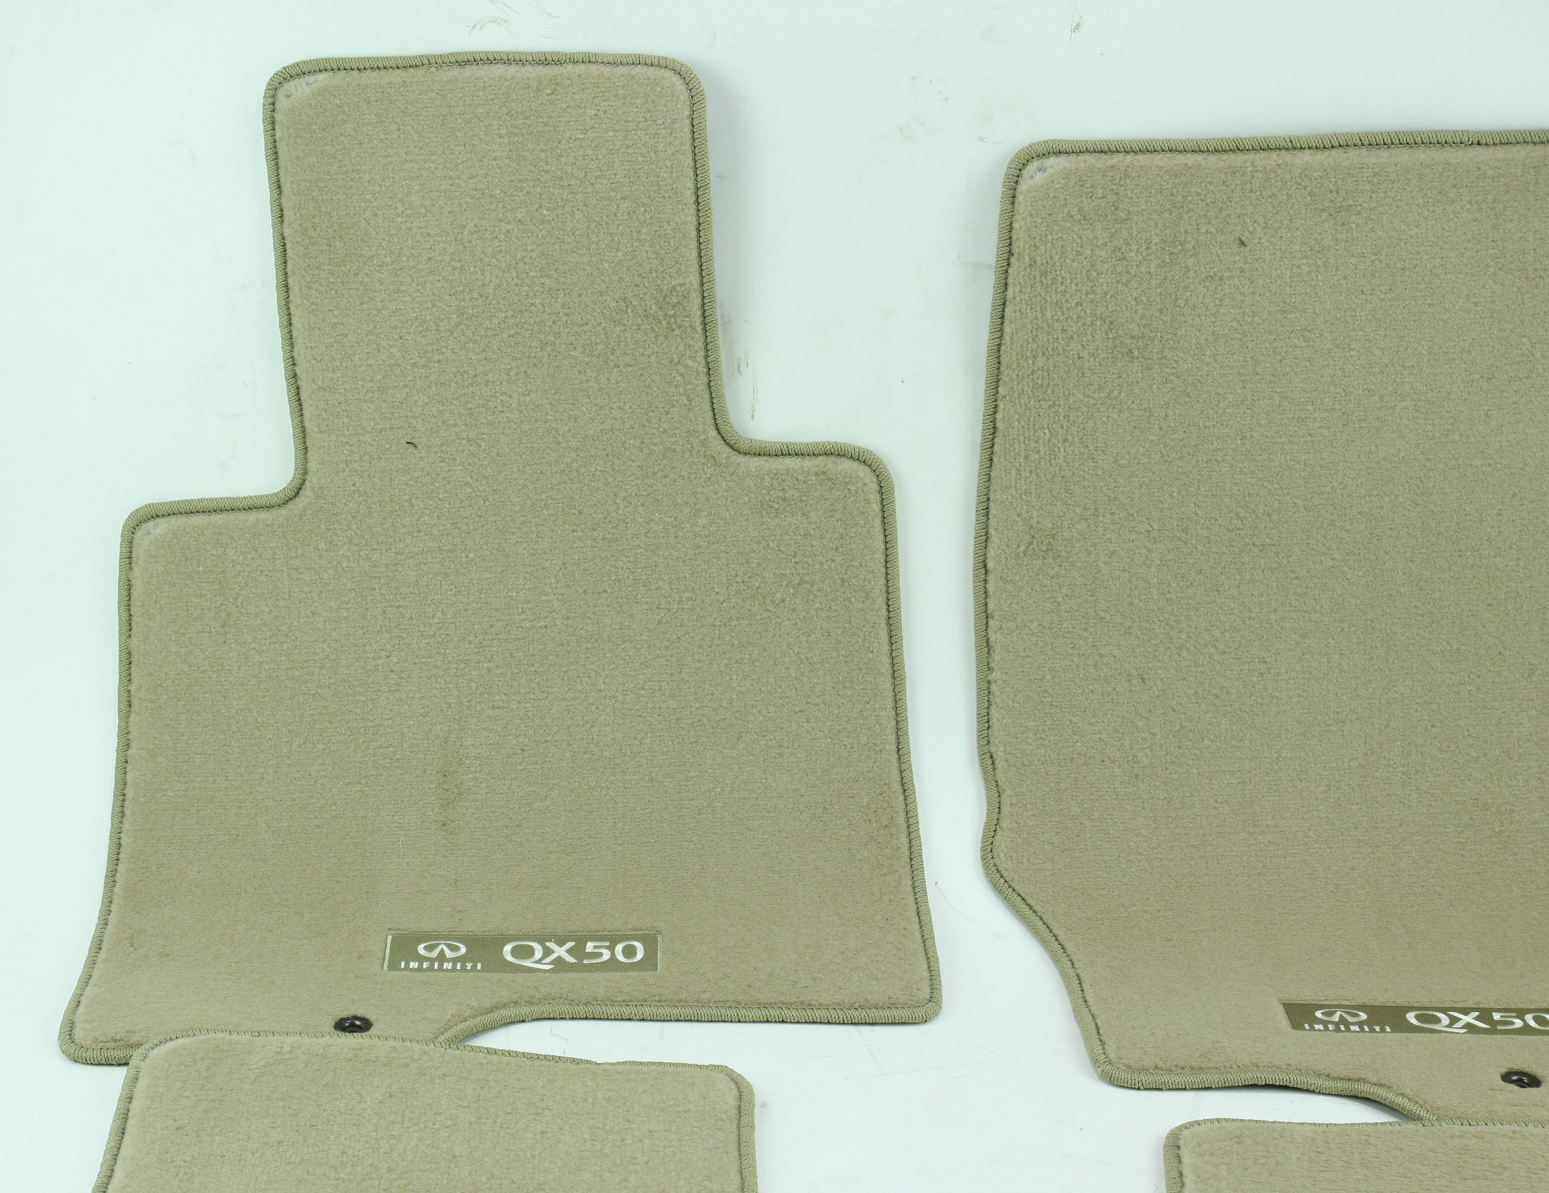 ** Genuine Infiniti Floor Mats Carpeted Wheat Nissan G4900-1UR4J New OEM - image 3